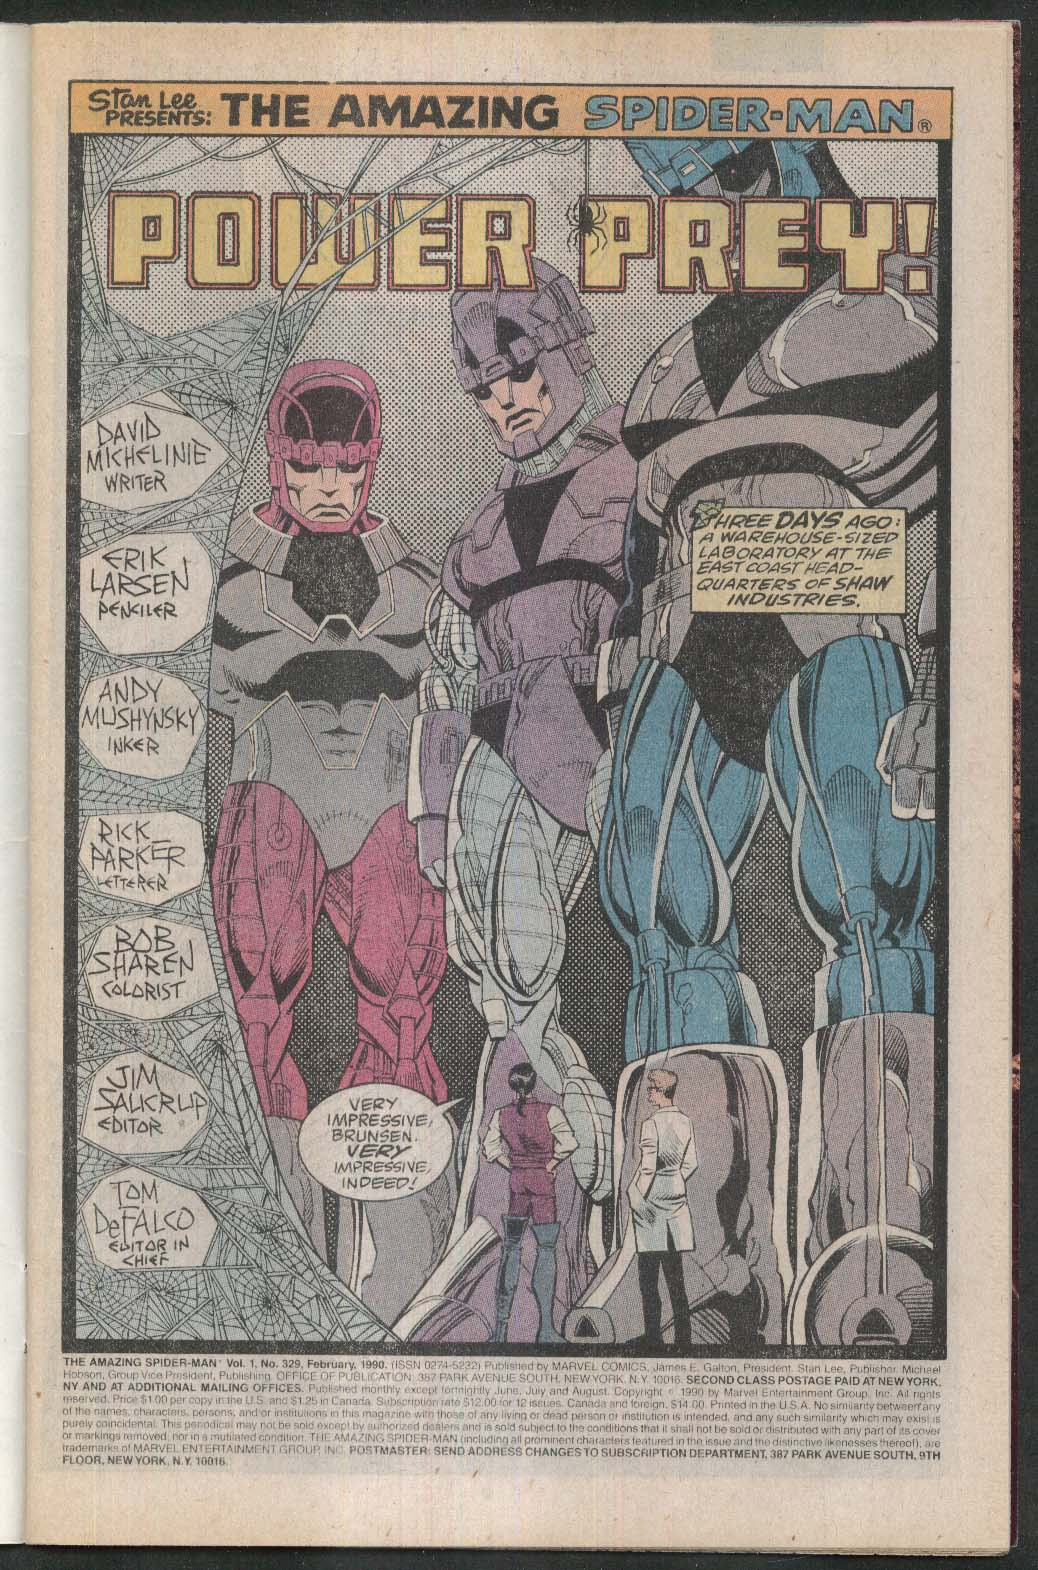 AMAZING SPIDER-MAN #329 Marvel comic book 2 1990 Tri-Sentinel